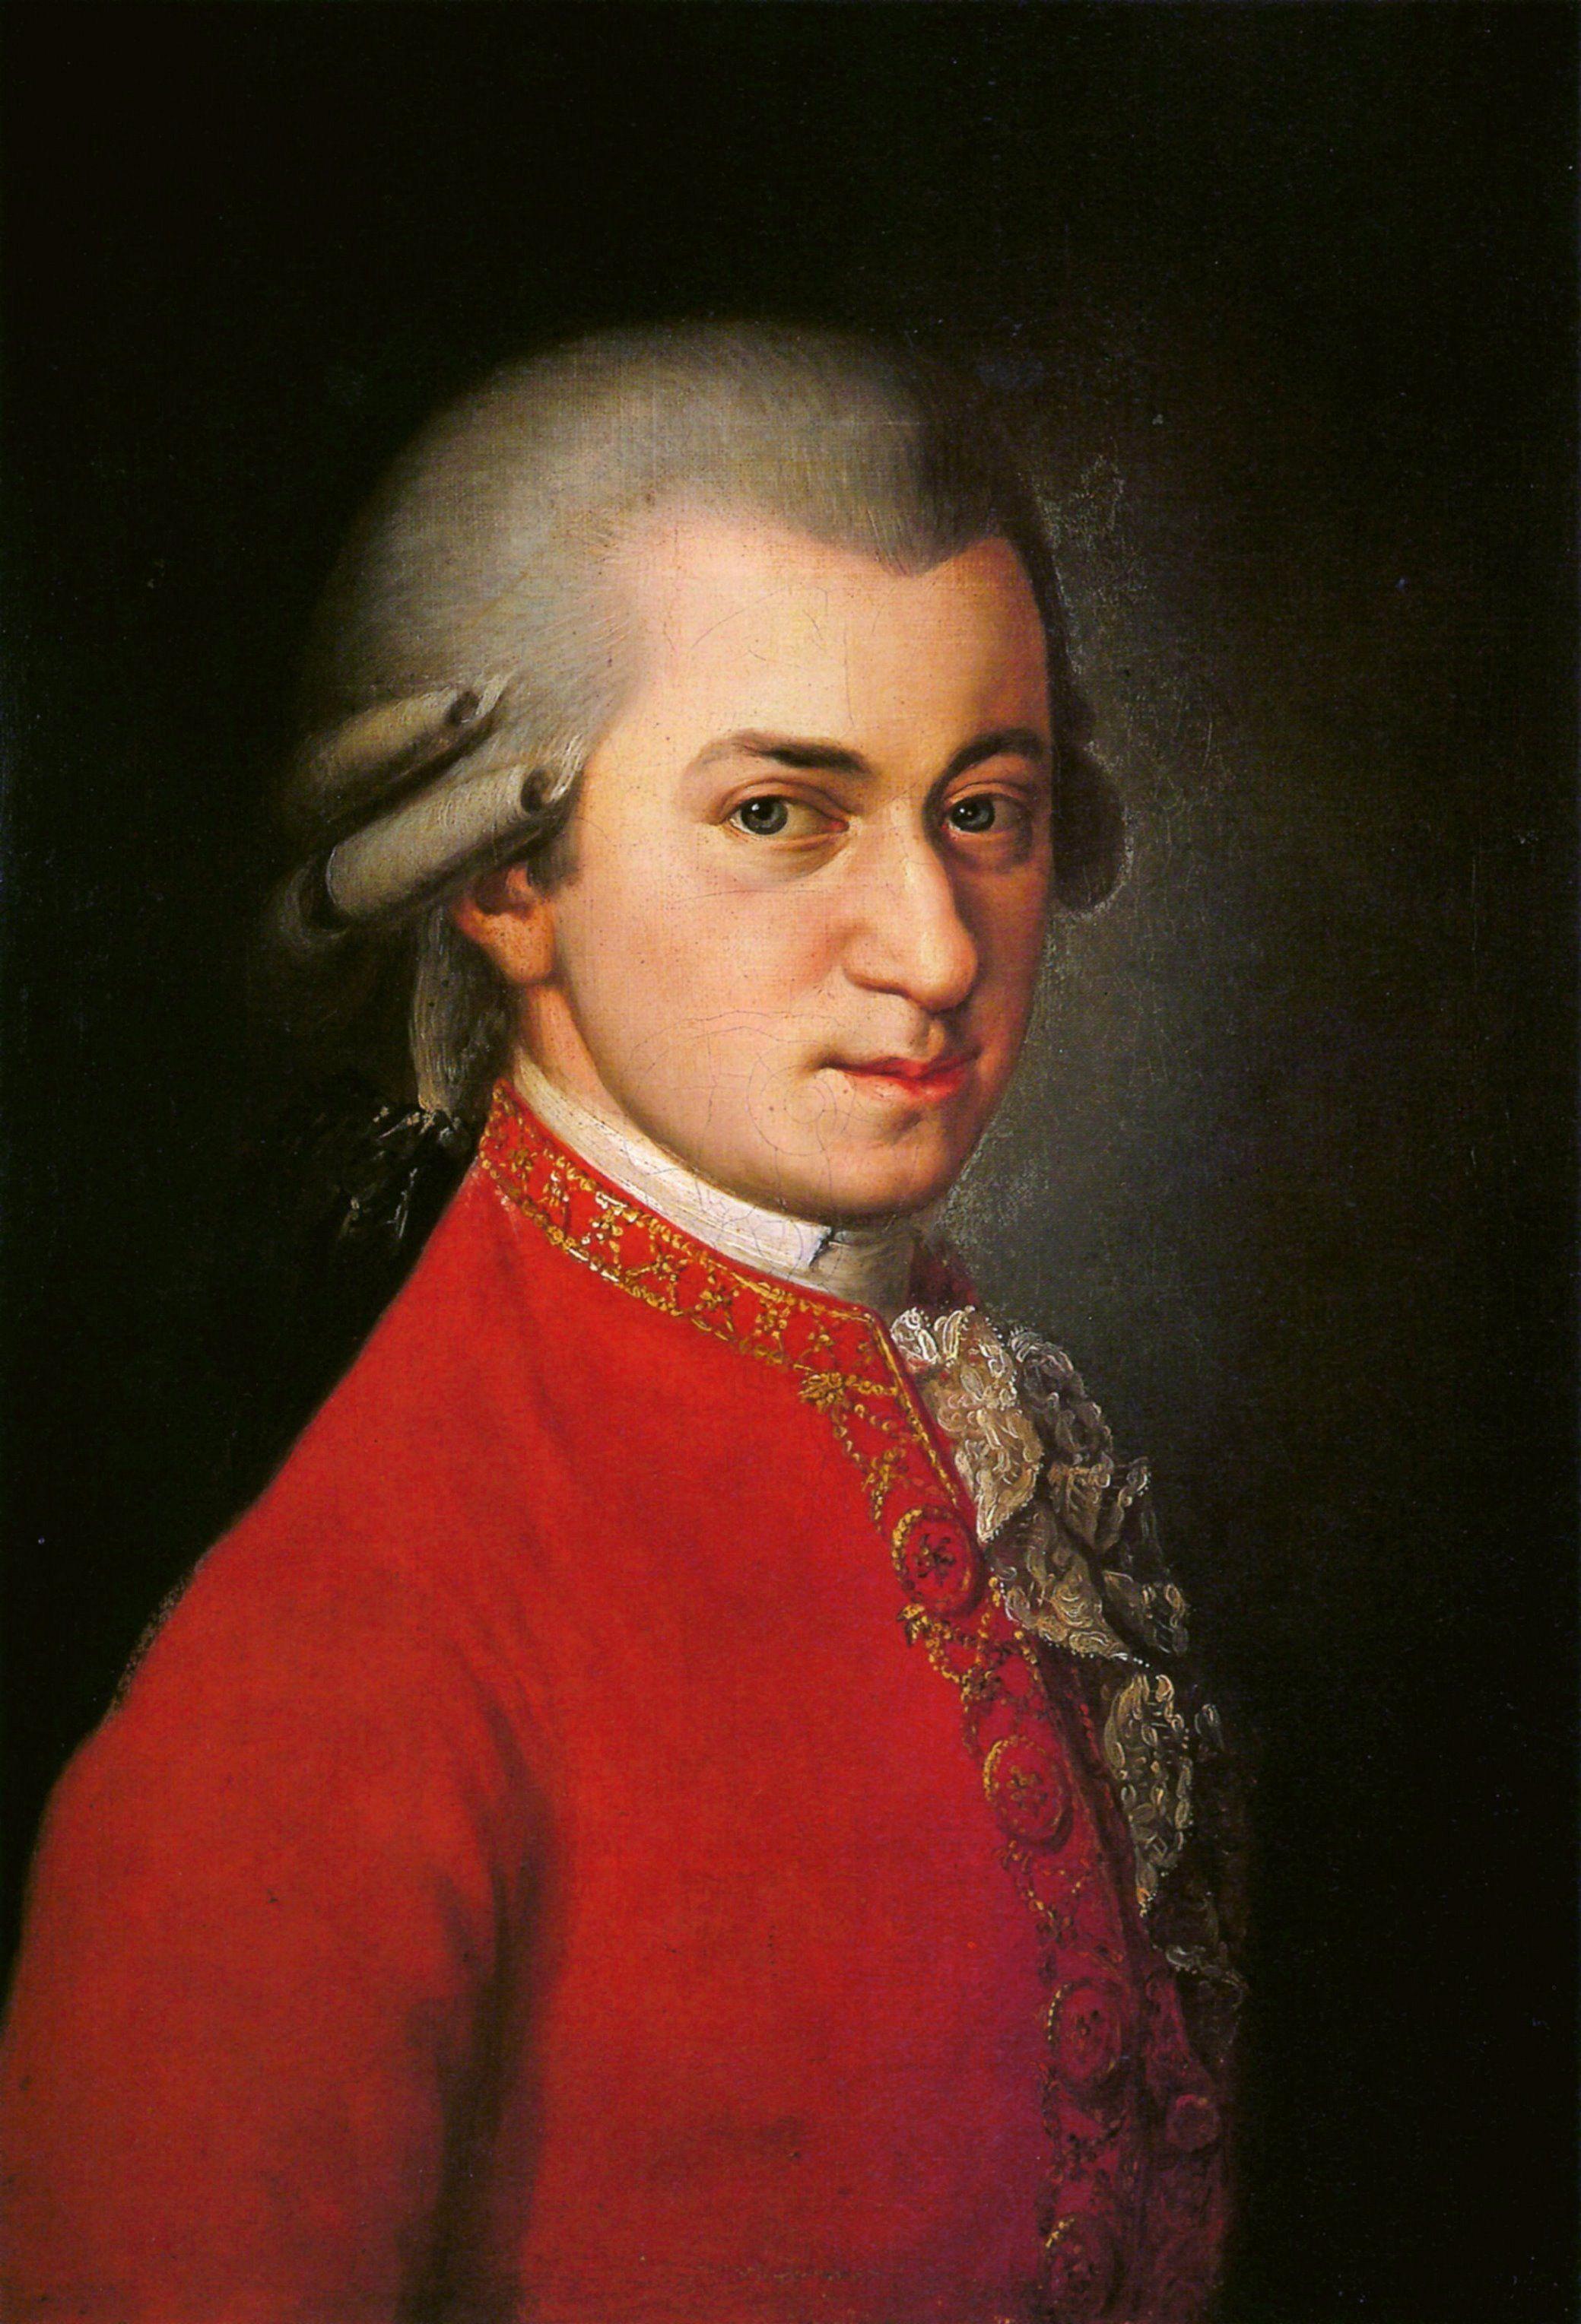 Wolfgang Amadeus Mozart Painting By Barbara Krafft [Public Domain